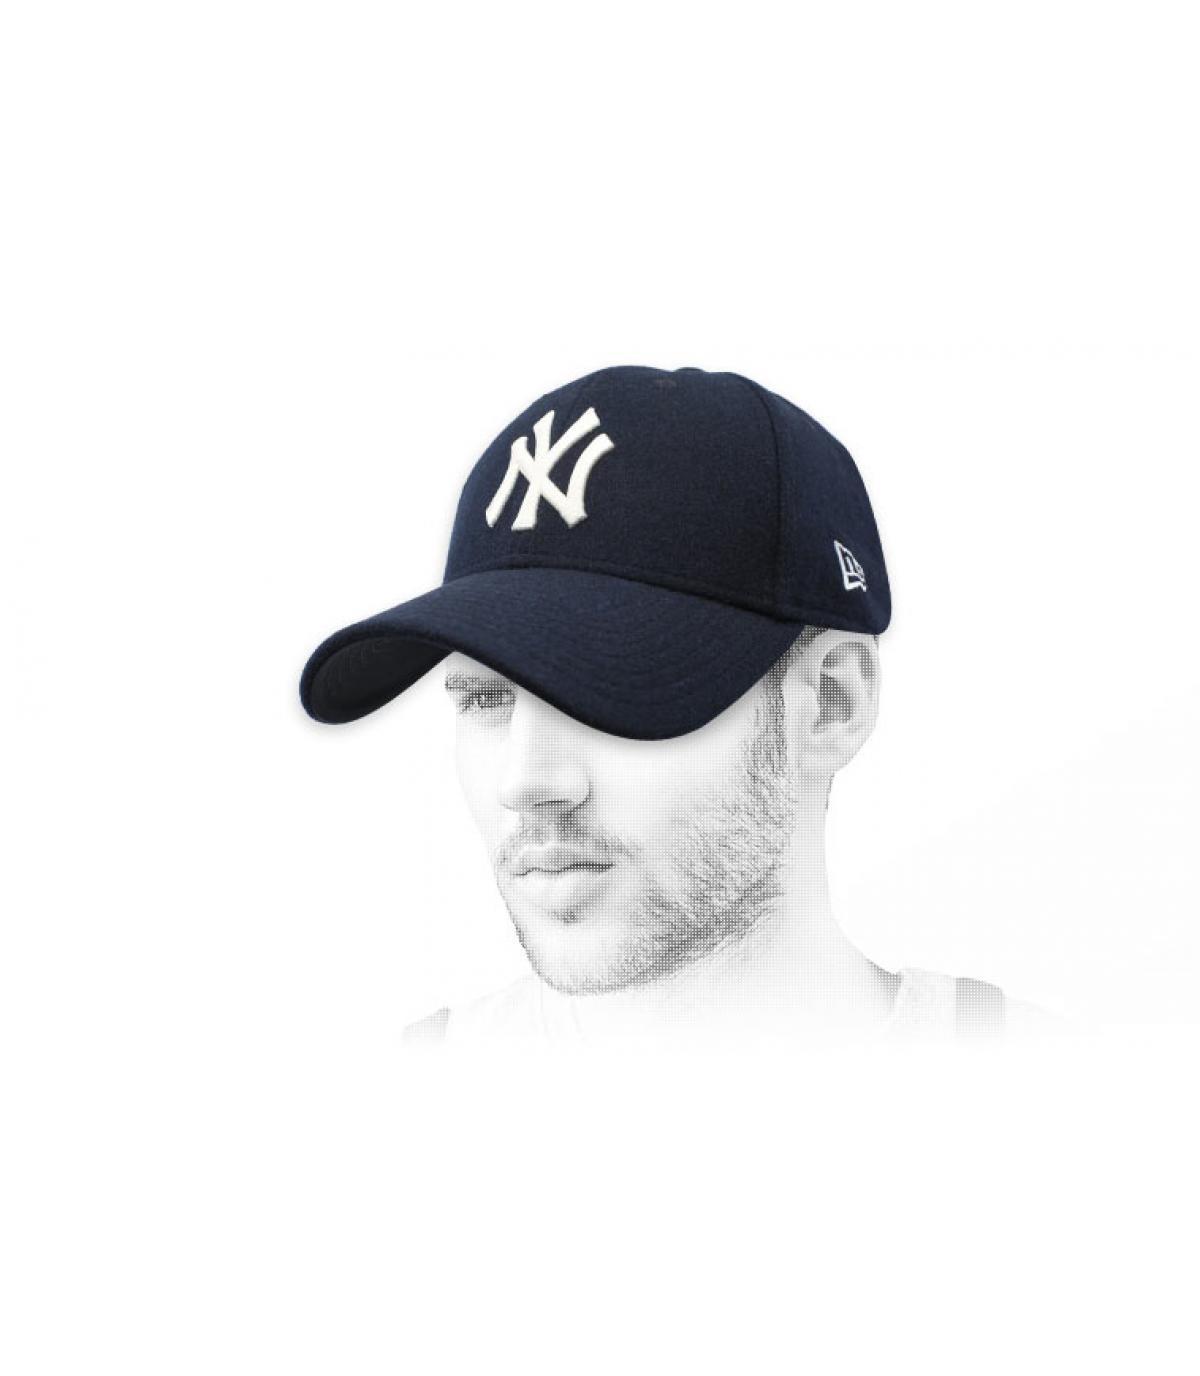 NY blauwe wollen muts